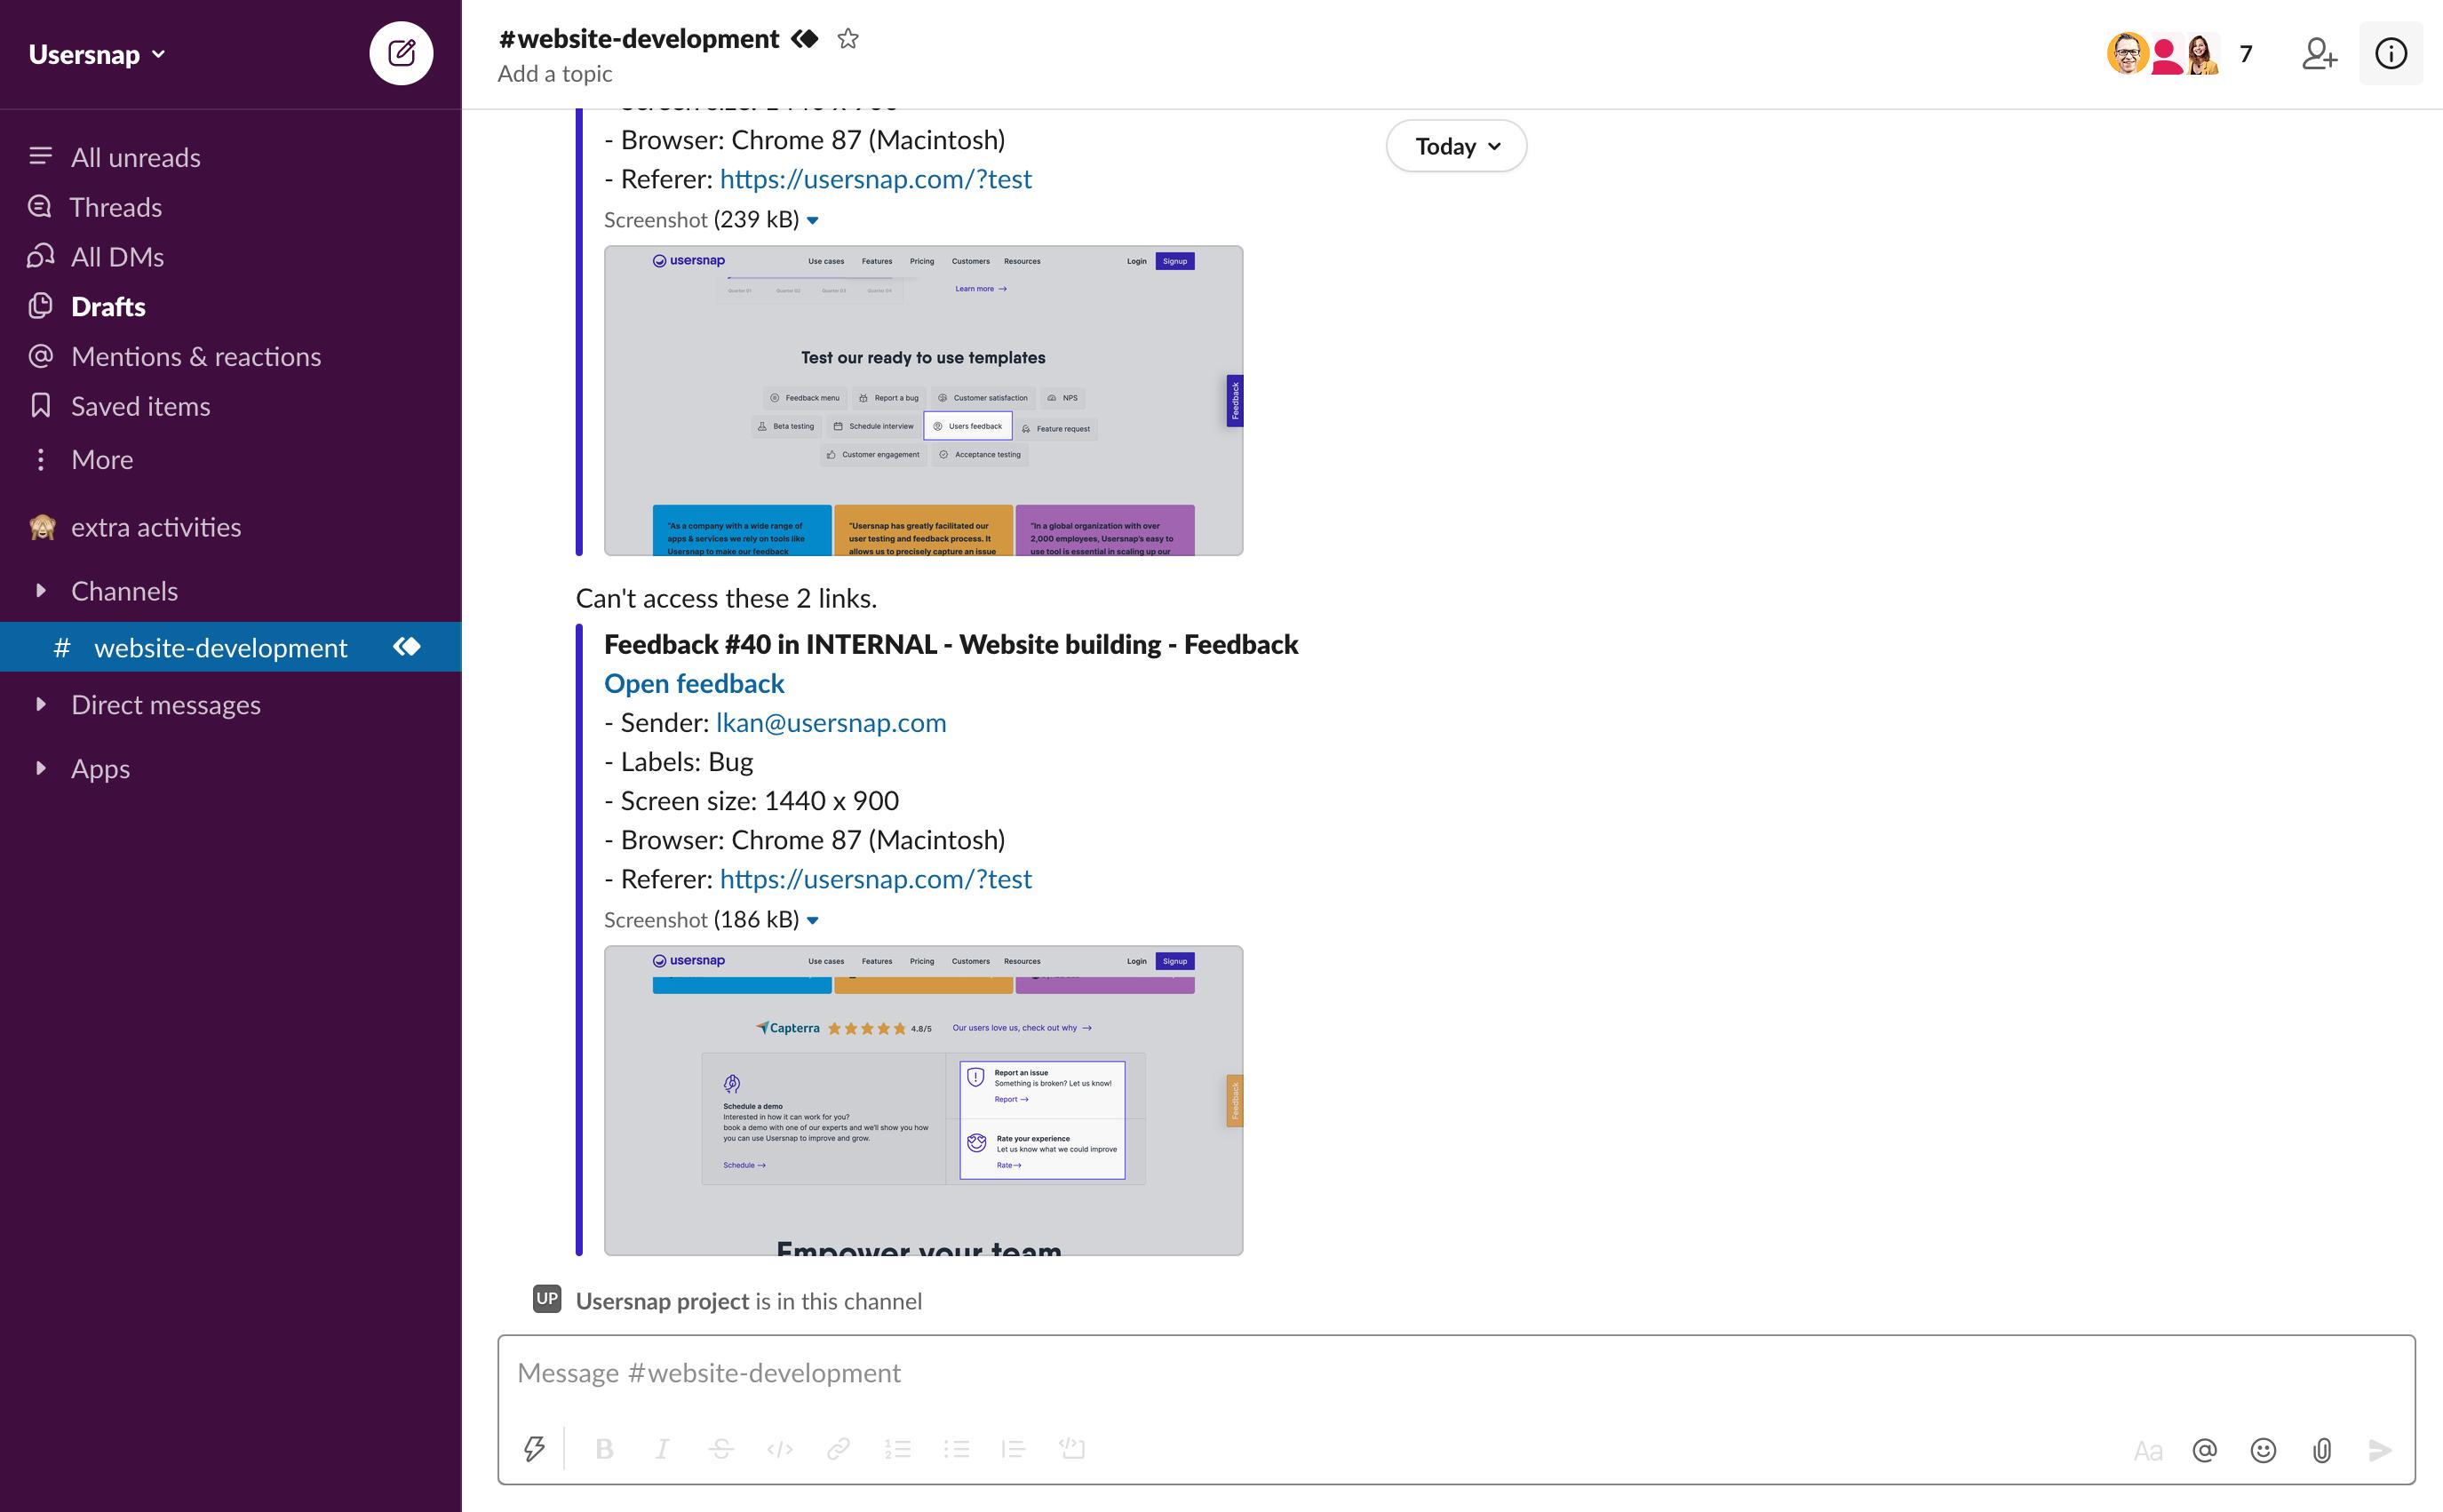 Usersnap feedbacks in Slack